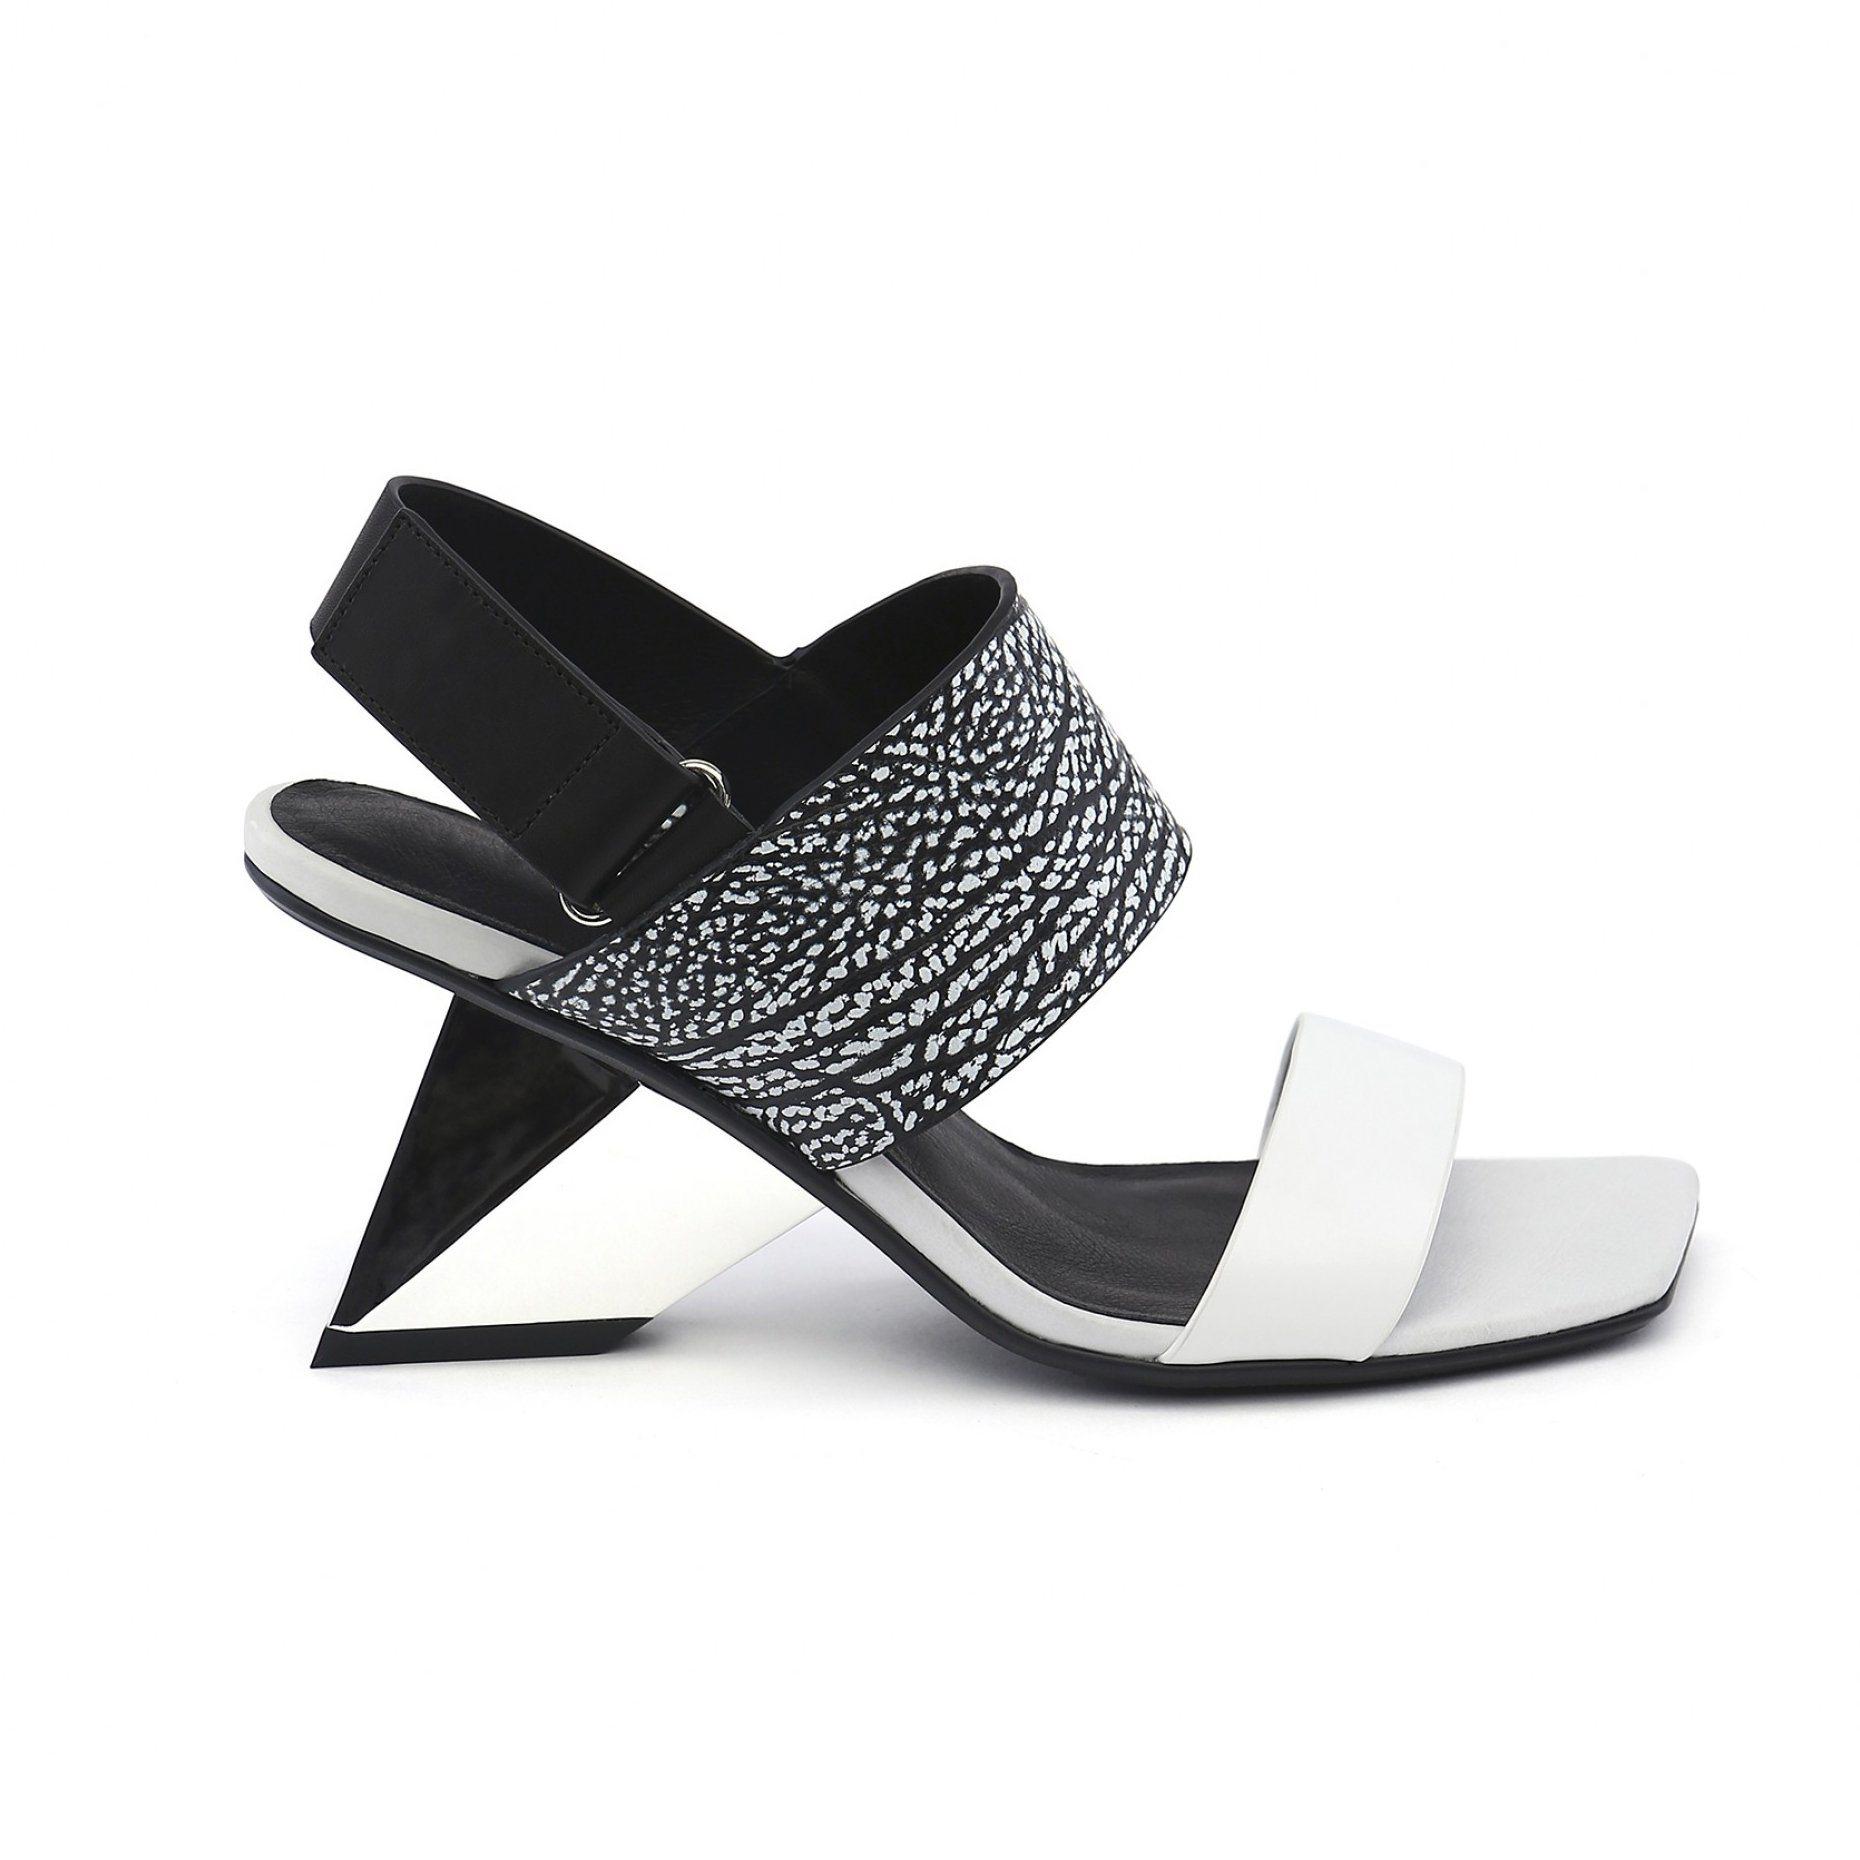 d36e6f897792 China easy to wear fashion forward two straps sandal for women china women  sandal sandals jpg